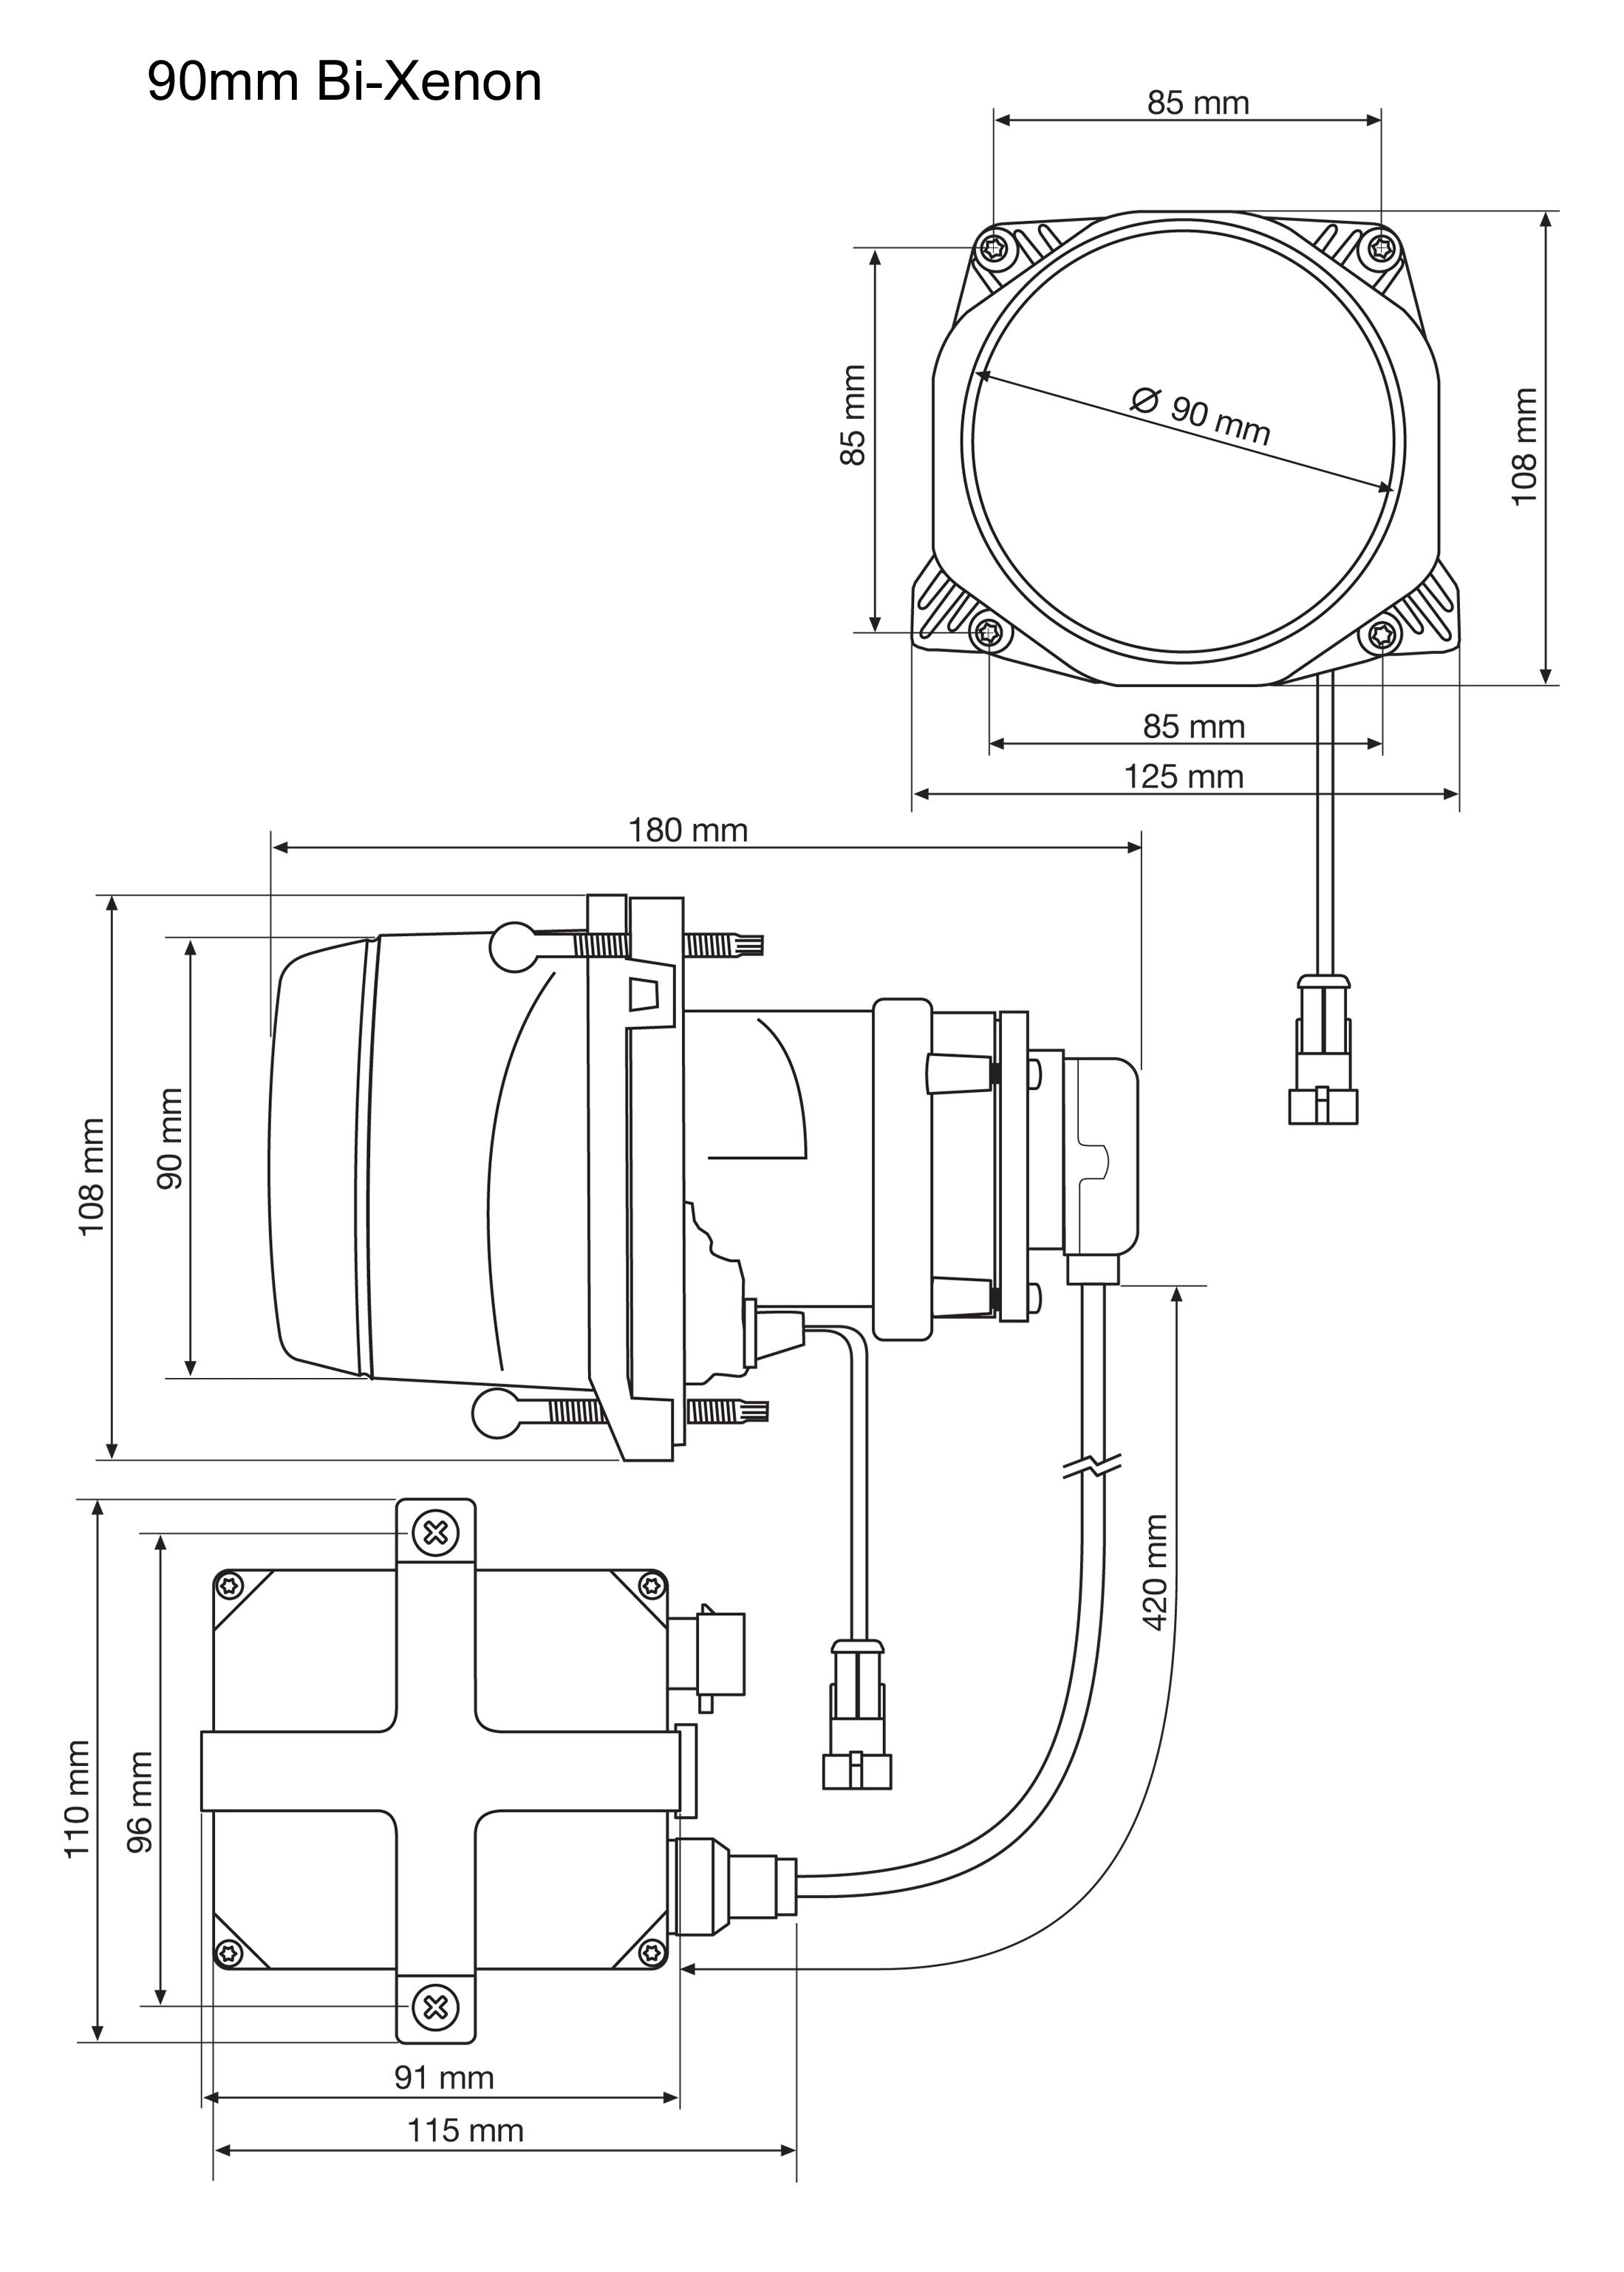 Hella 90mm De Bi Xenon Headlamp